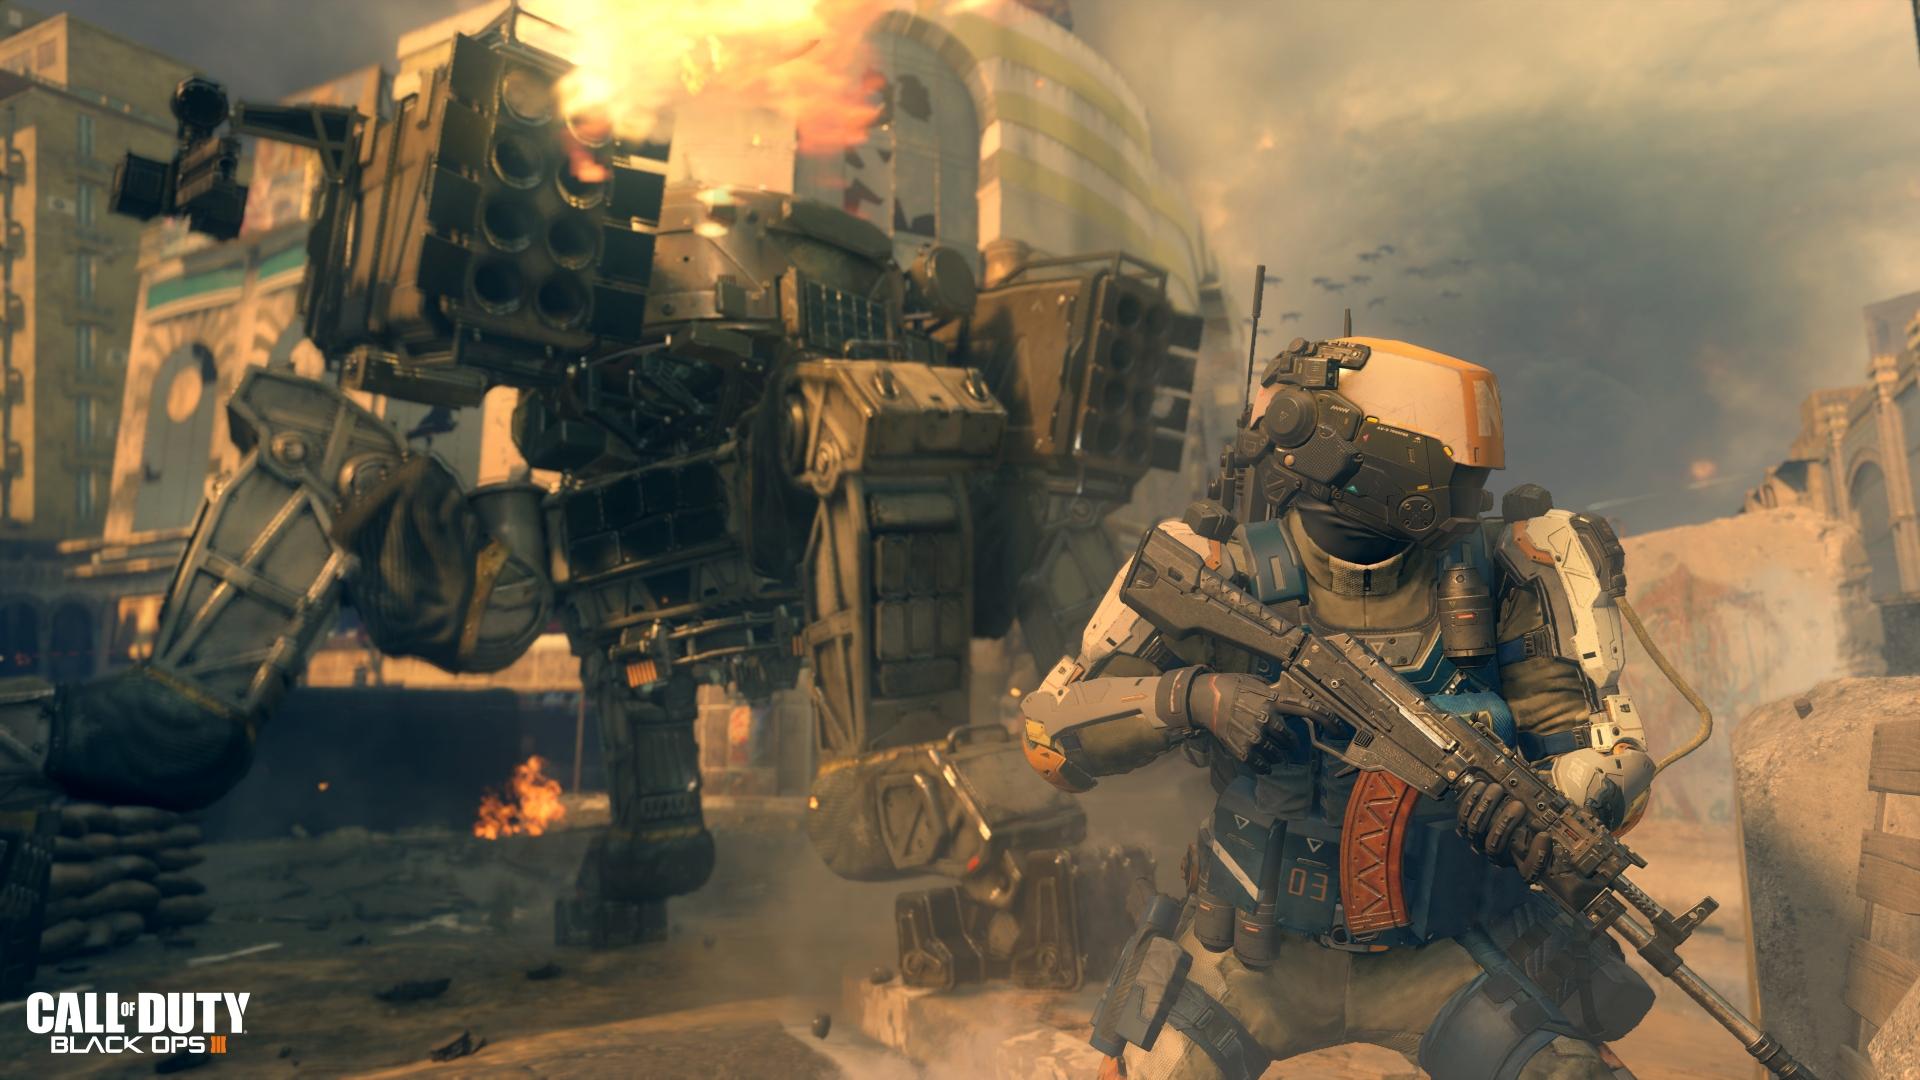 Black Ops 3_Ramses Station_Quad Tank_t